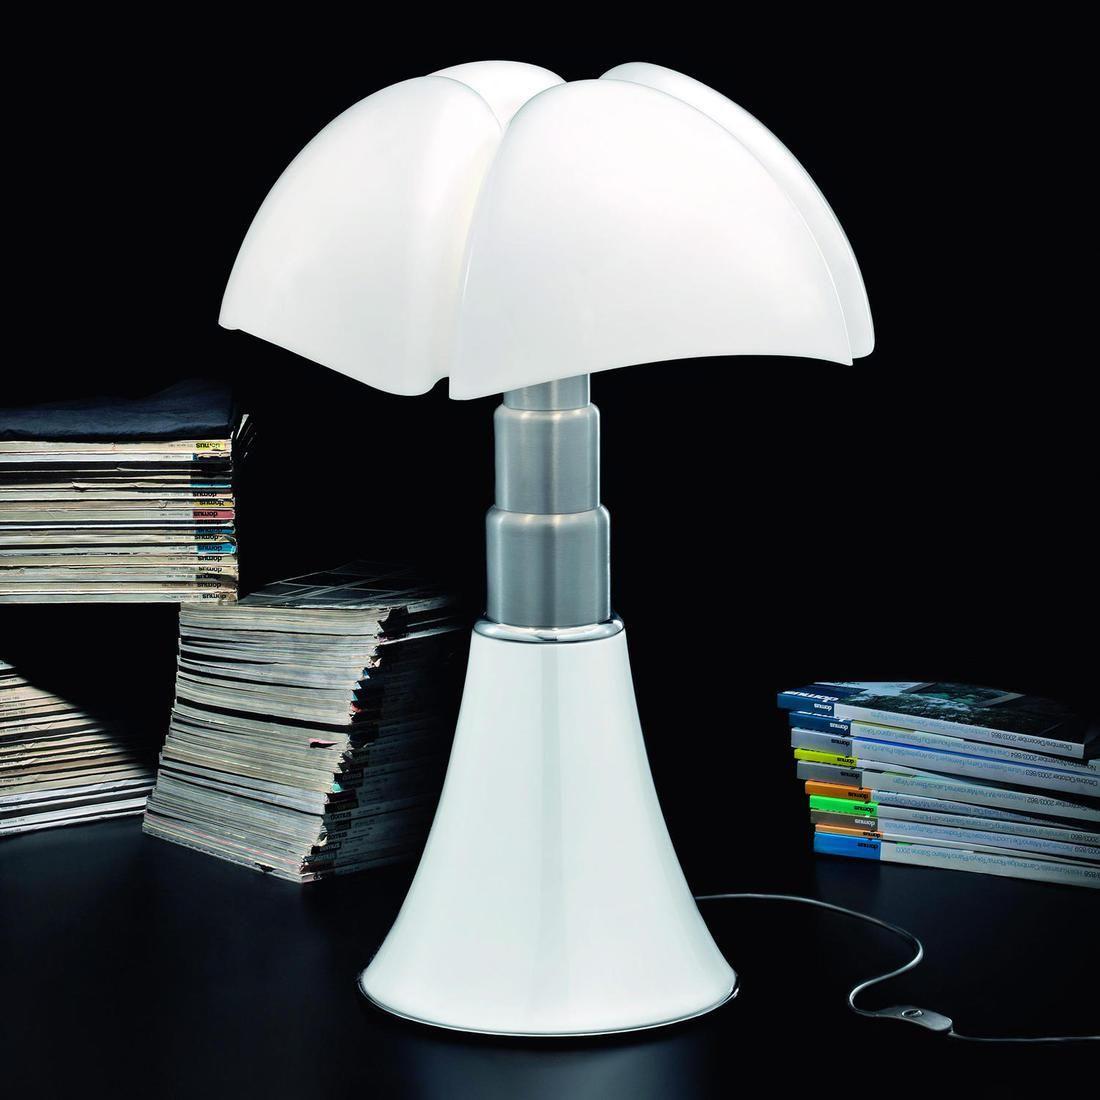 Lampe Blanc Pied Telescopique H66 86cm Pipistrello Lampe A Poser